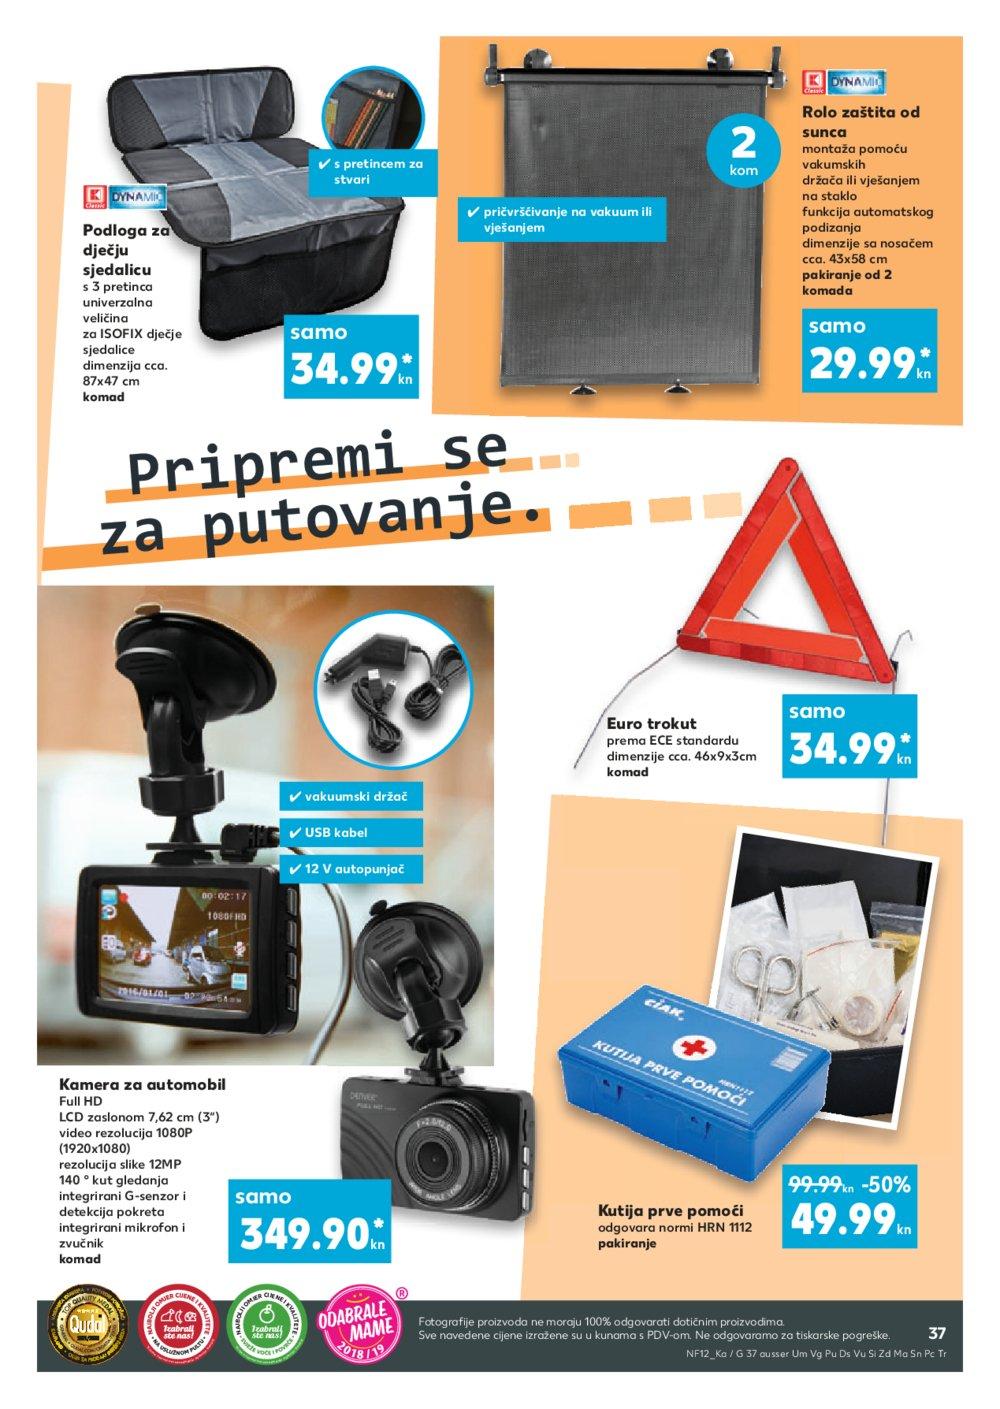 Kaufland katalog Akcija 11.7.-17.7.2019. Dja, NG, Os, Pž, SB, Vk, Vt